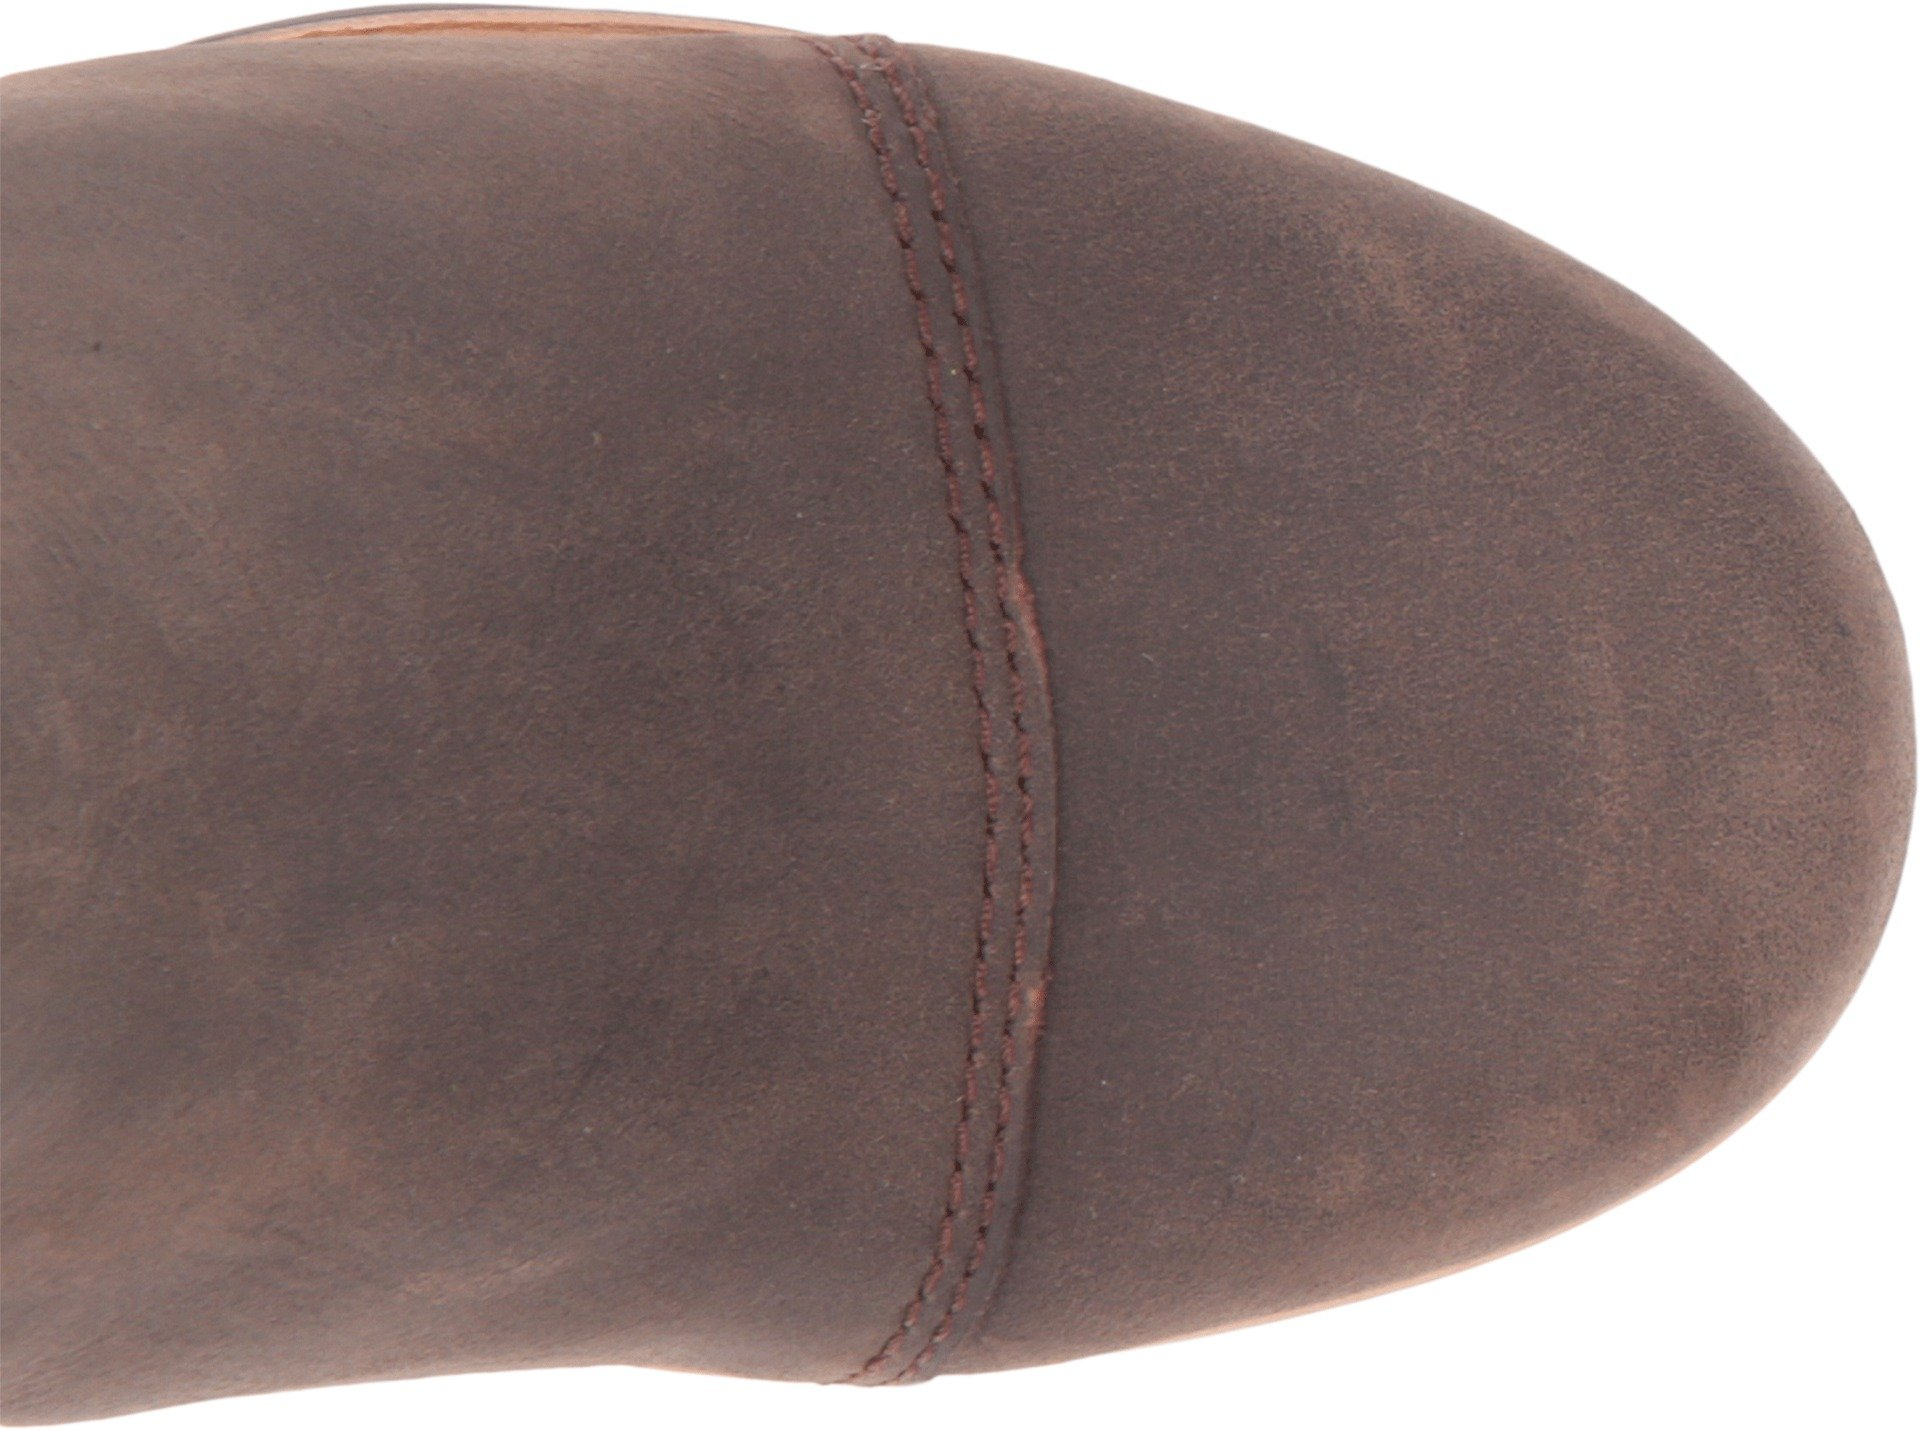 Sorel Addington Tall Boot - Women's Umber / Black 8.5 by SOREL (Image #2)